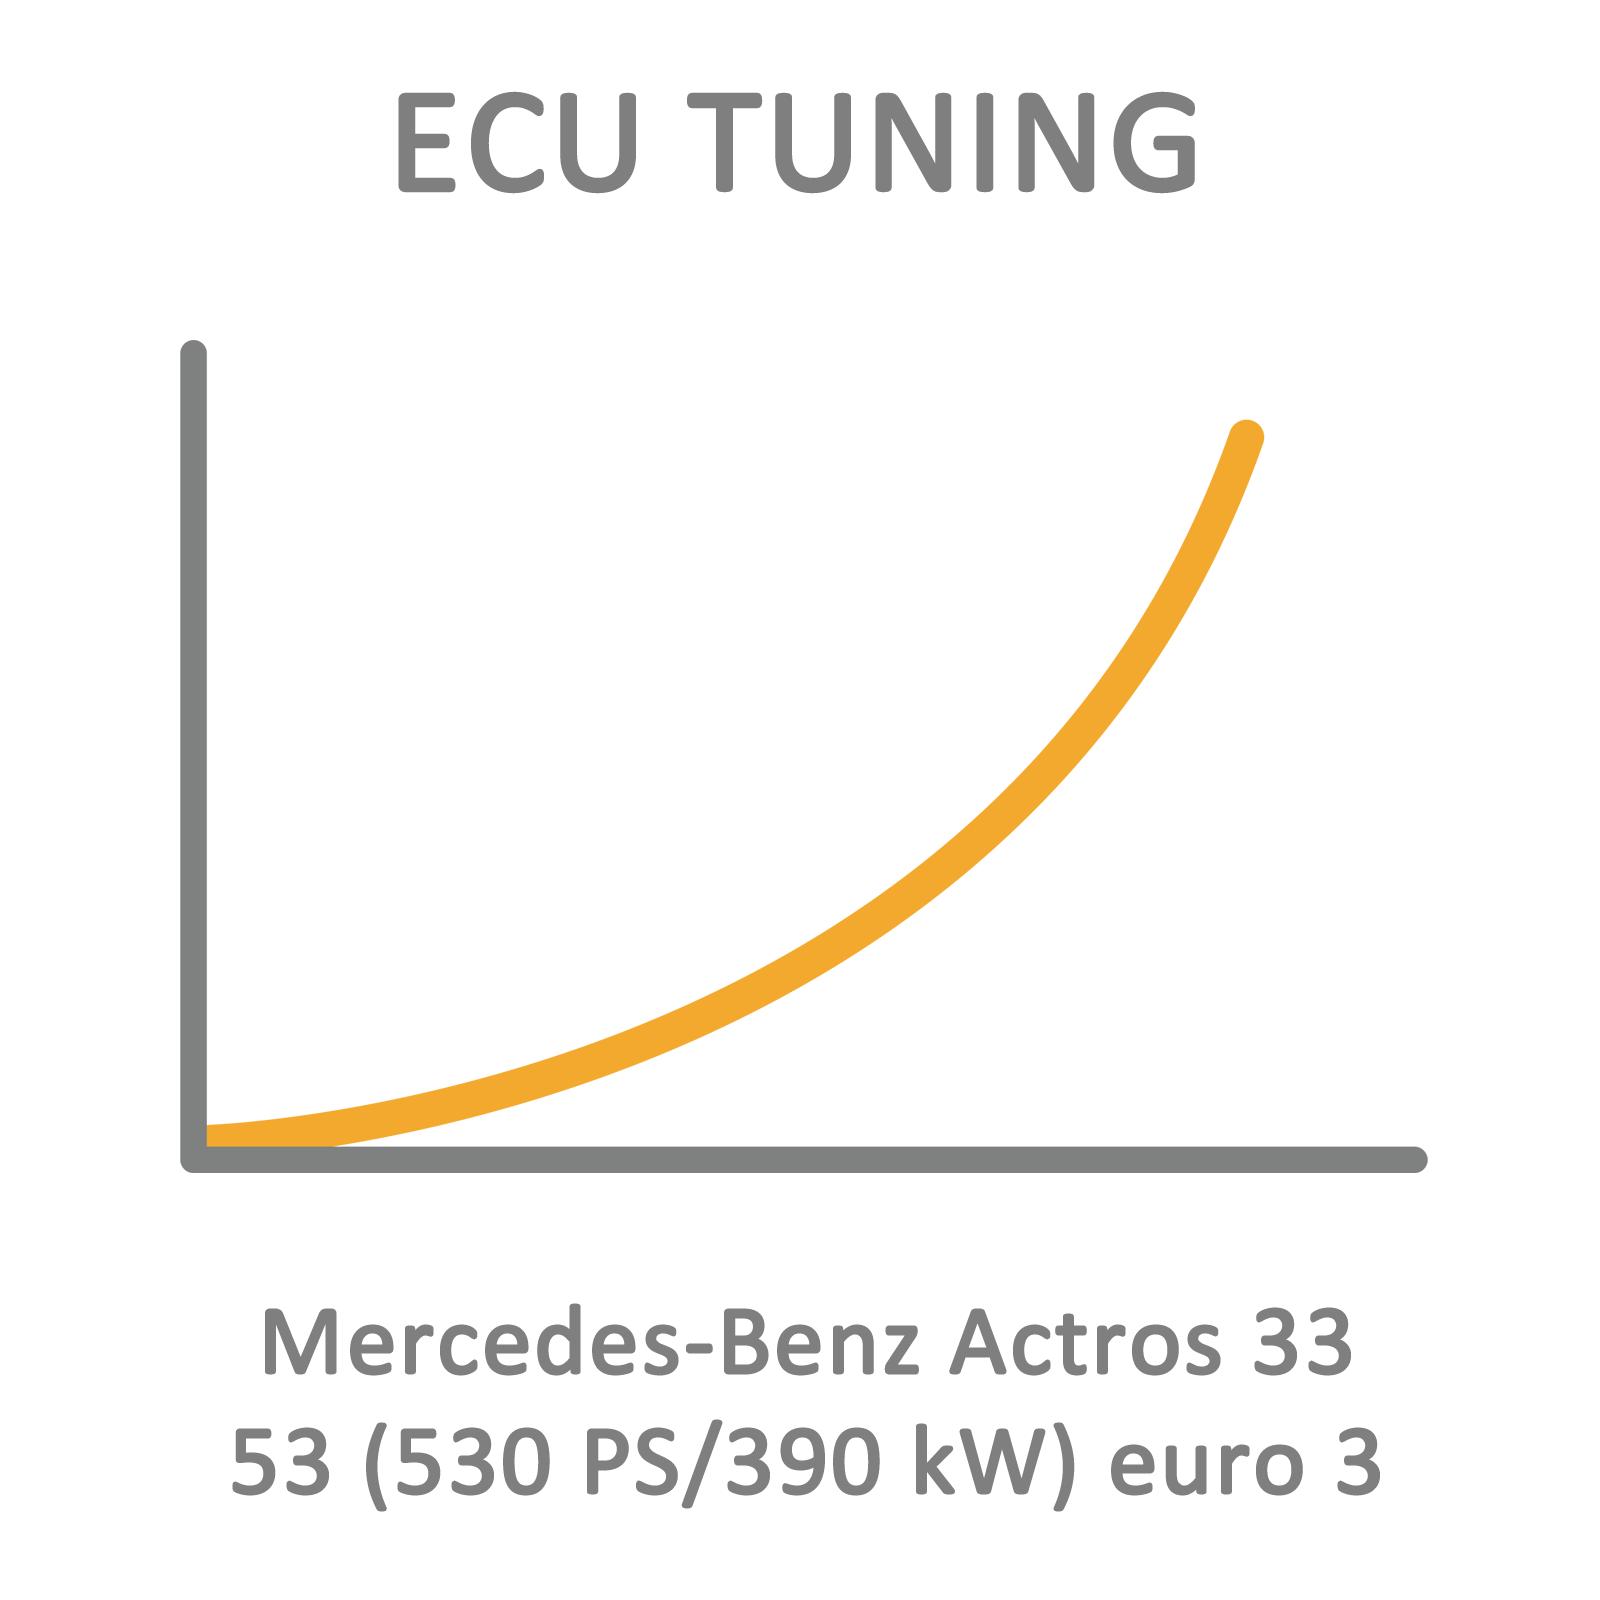 Mercedes-Benz Actros 33 53 (530 PS/390 kW) euro 3 ECU